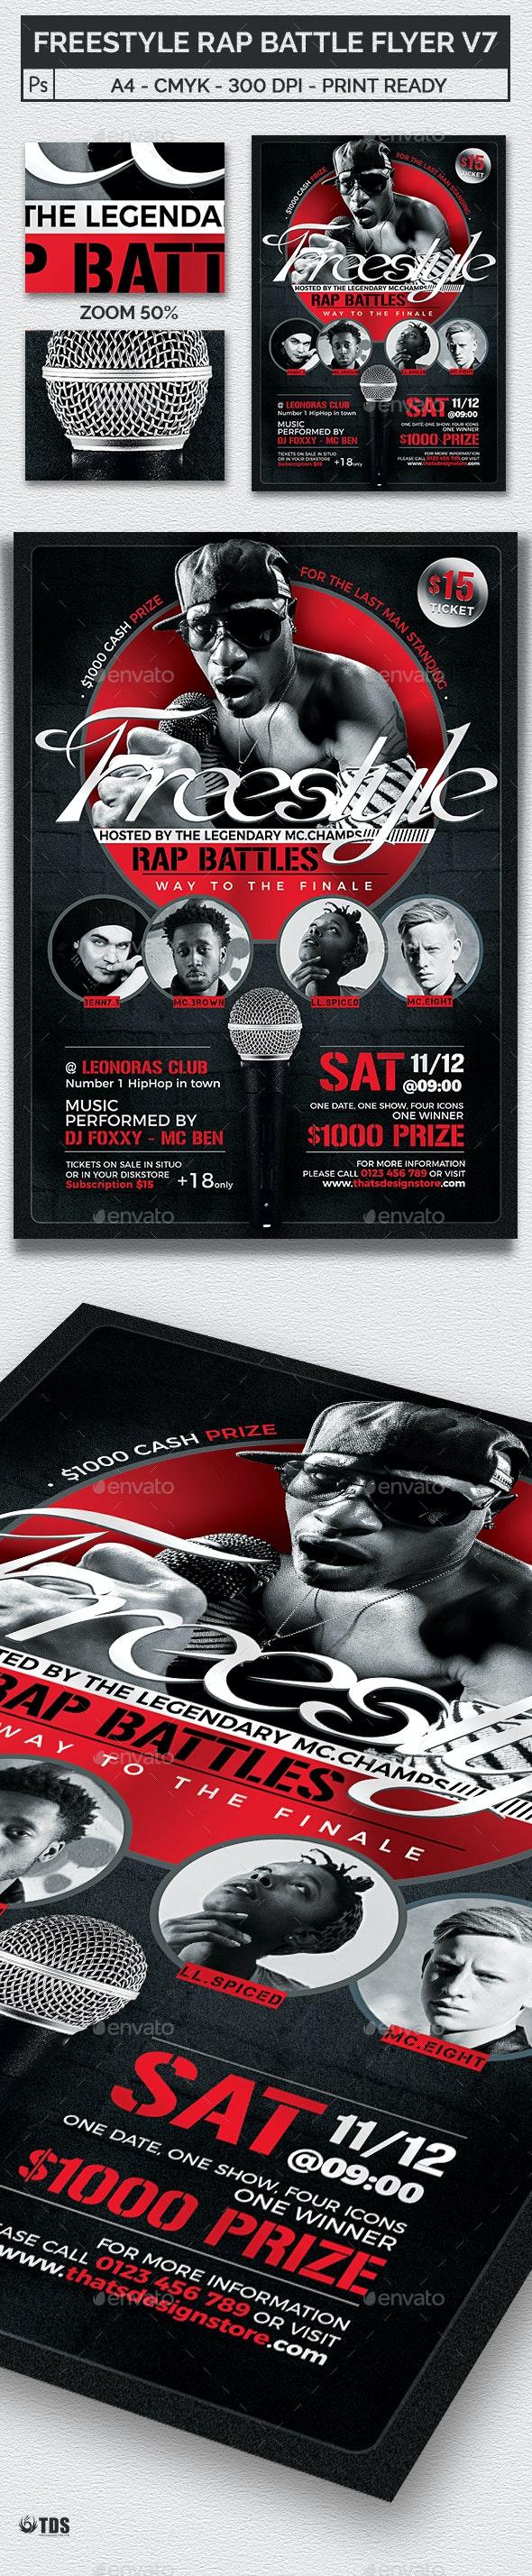 Freestyle Rap Battle Flyer Template V7 - Clubs & Parties Events